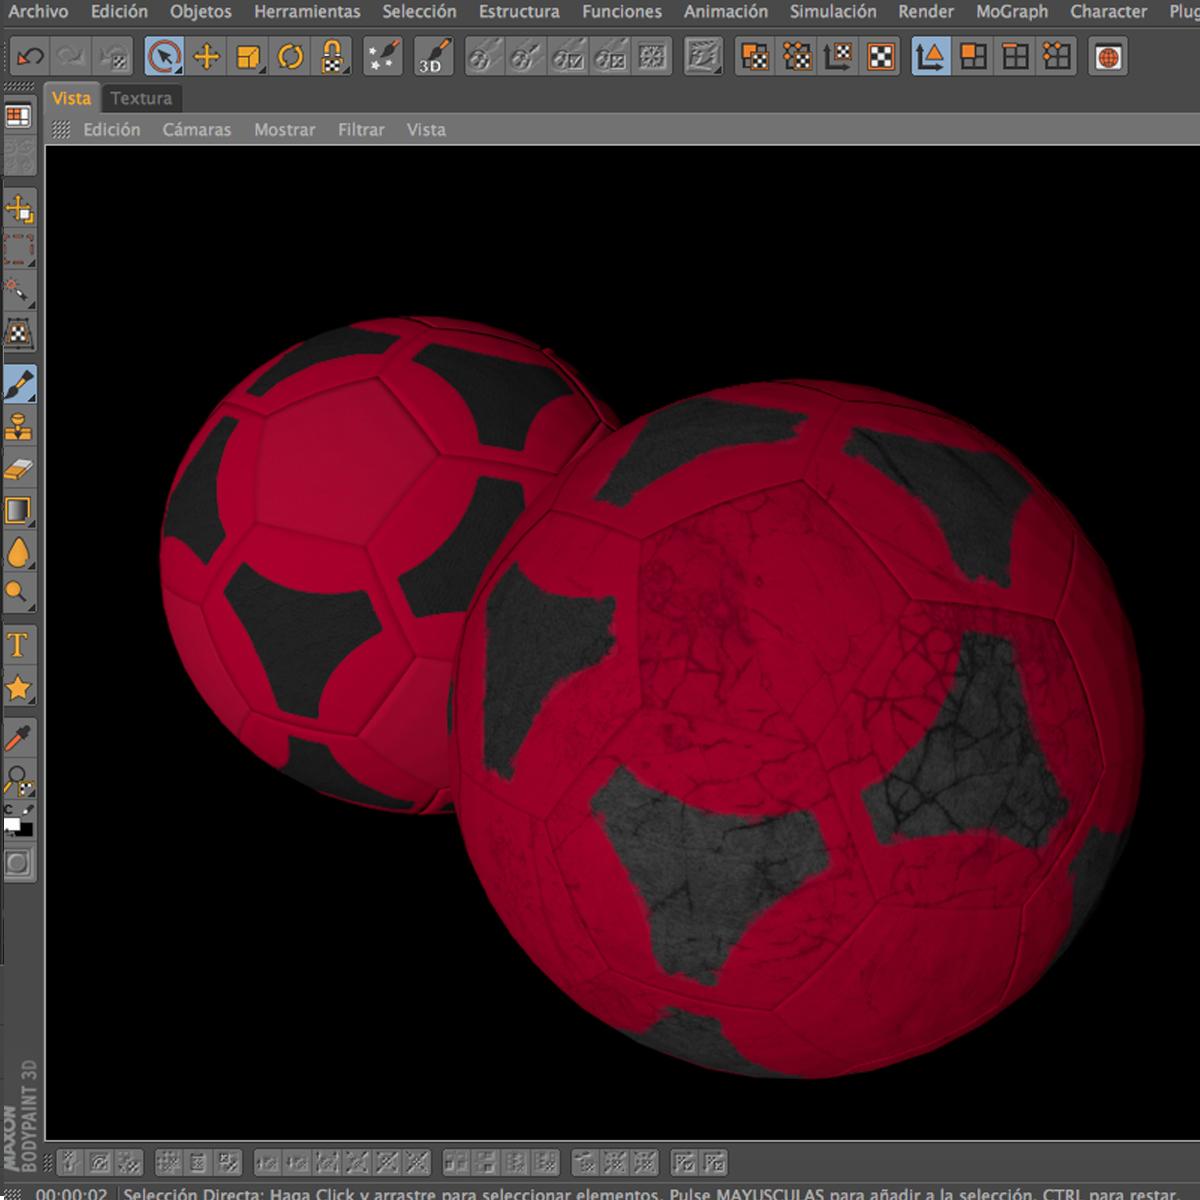 soccerball red black 3d model 3ds max fbx c4d ma mb obj 204558